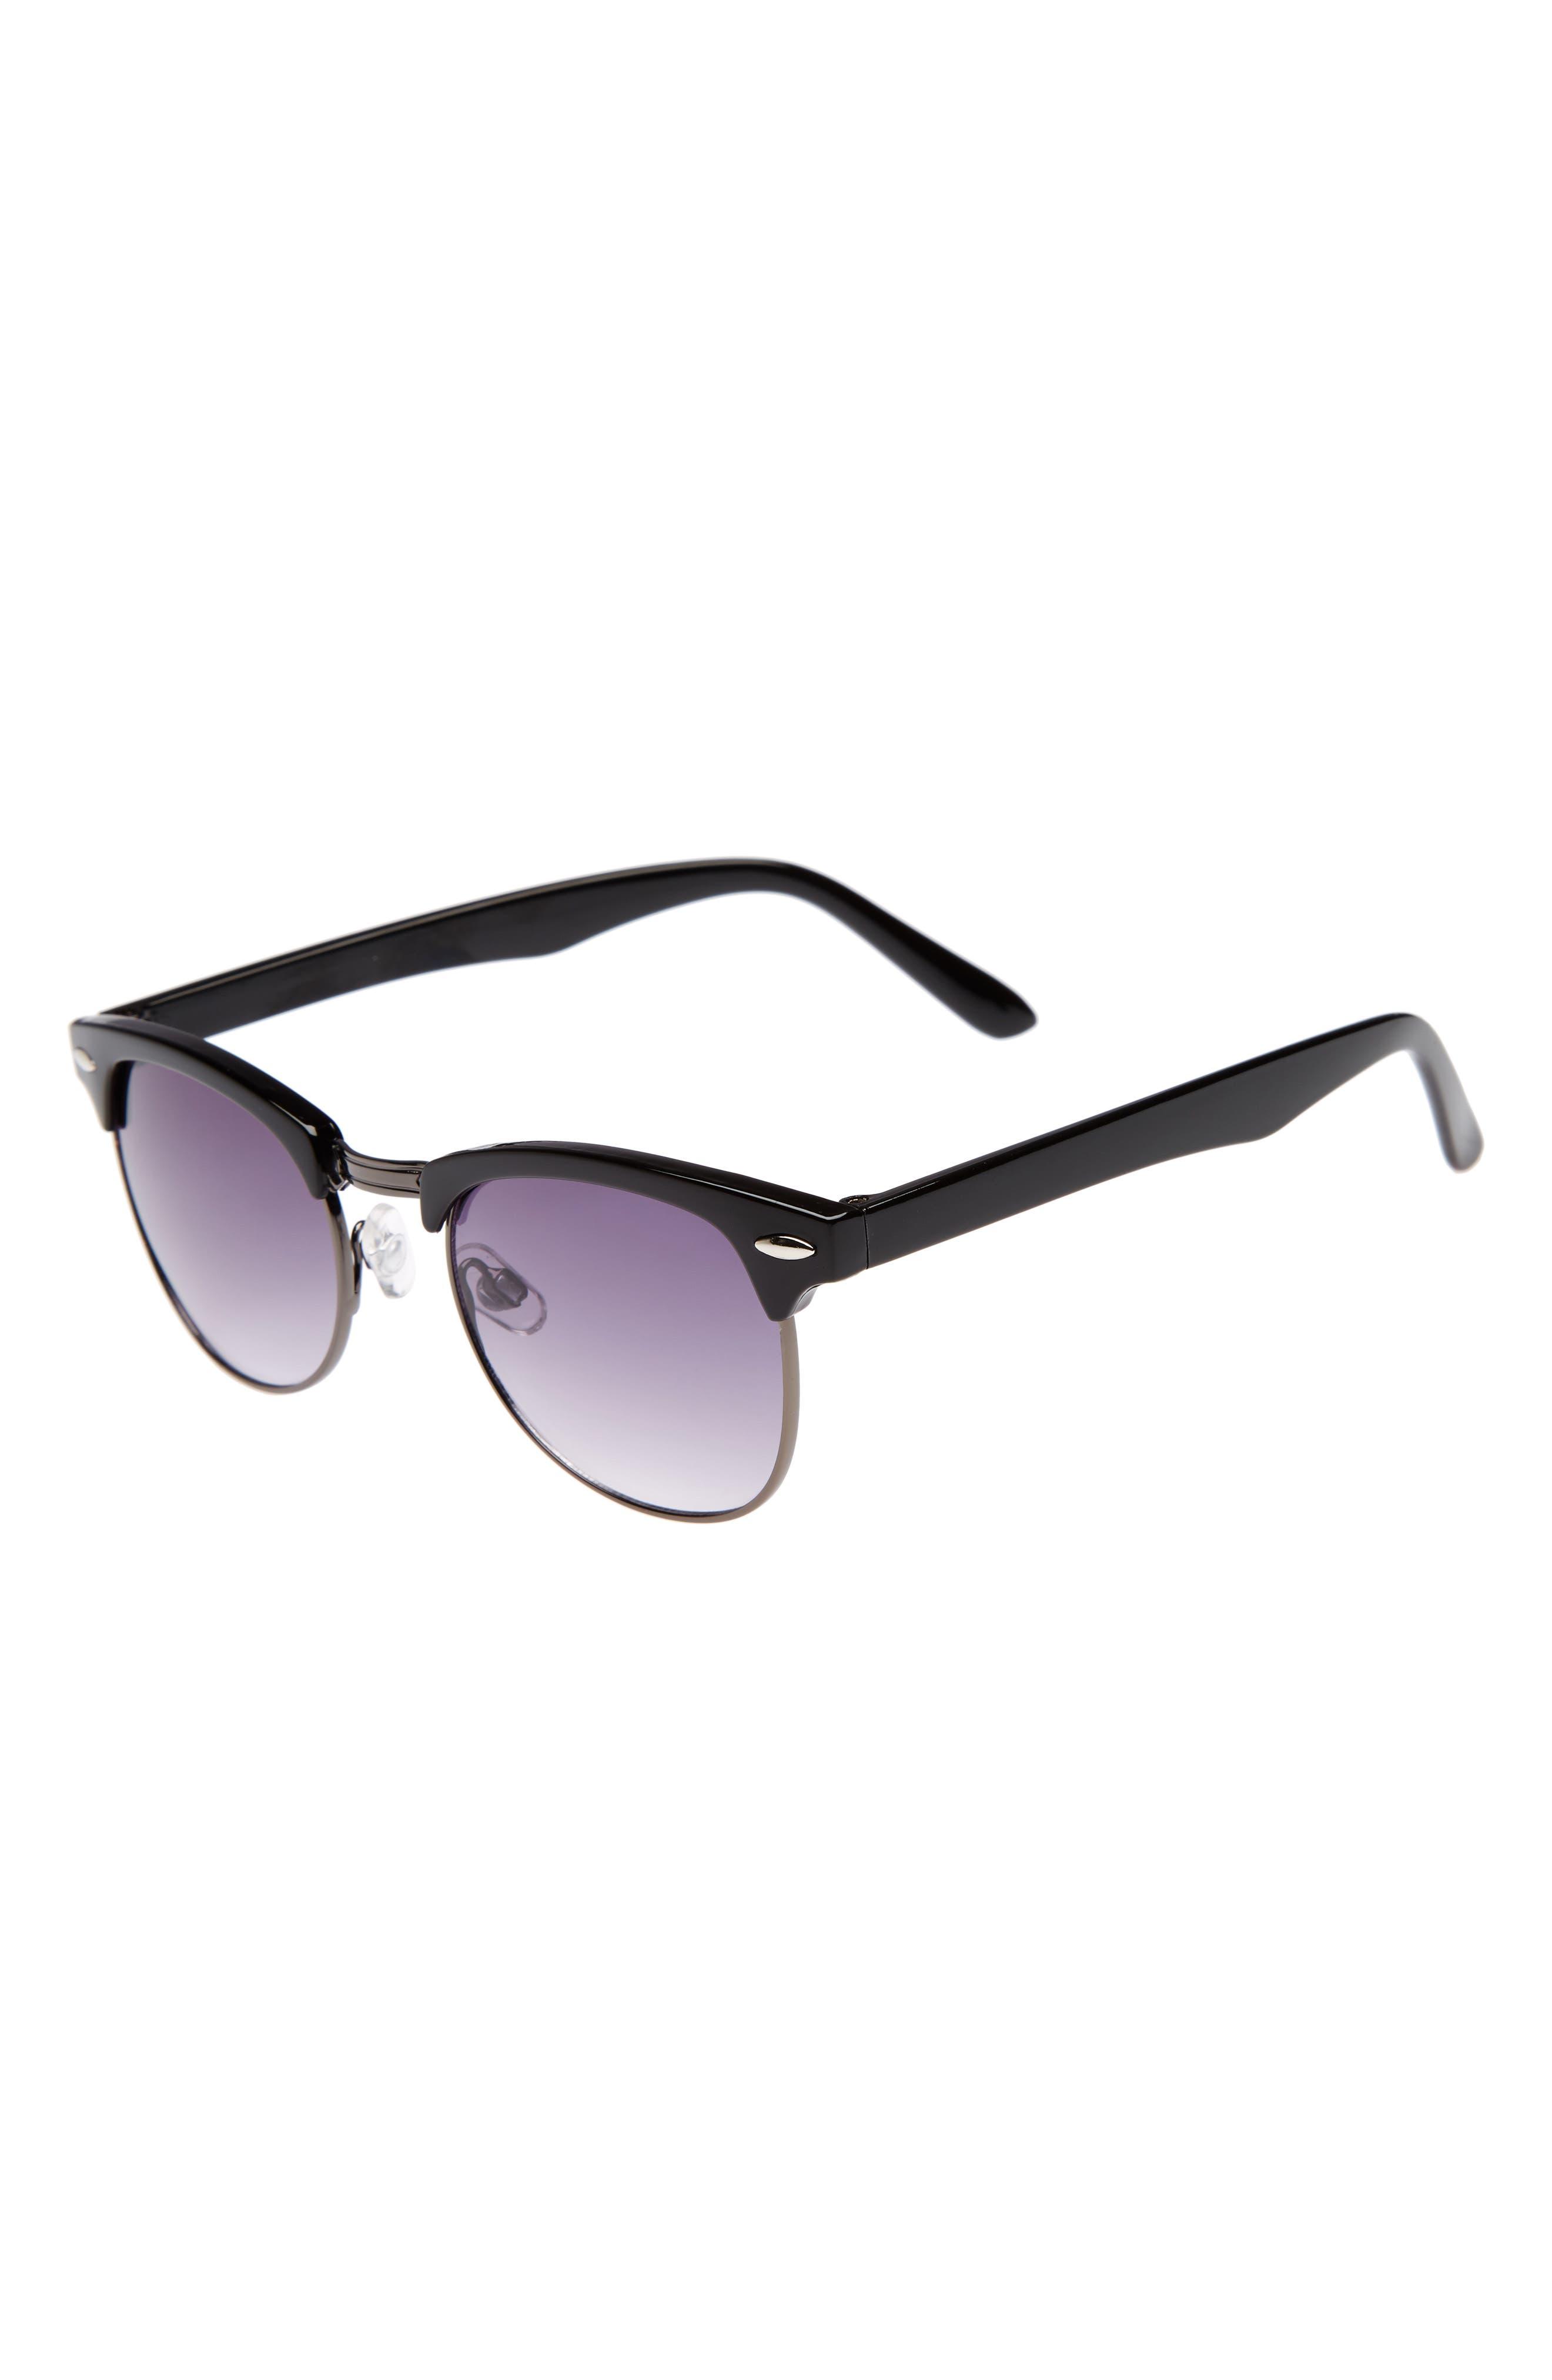 Horn Rimmed Sunglasses,                         Main,                         color, Black/ Gunmetal